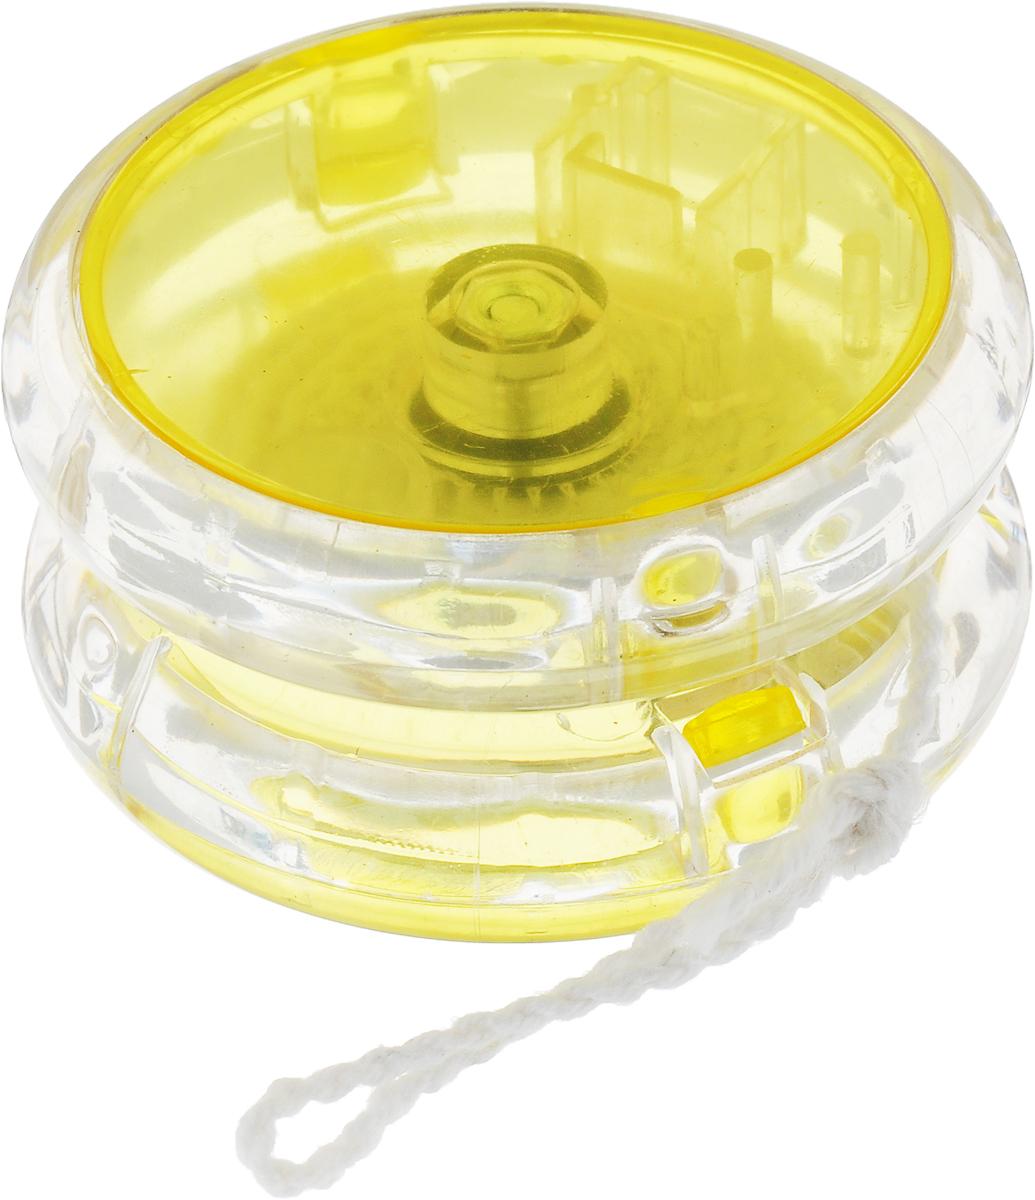 Sima-land Йо-йо Крутыш цвет желтый фонтан sima land три кувшина